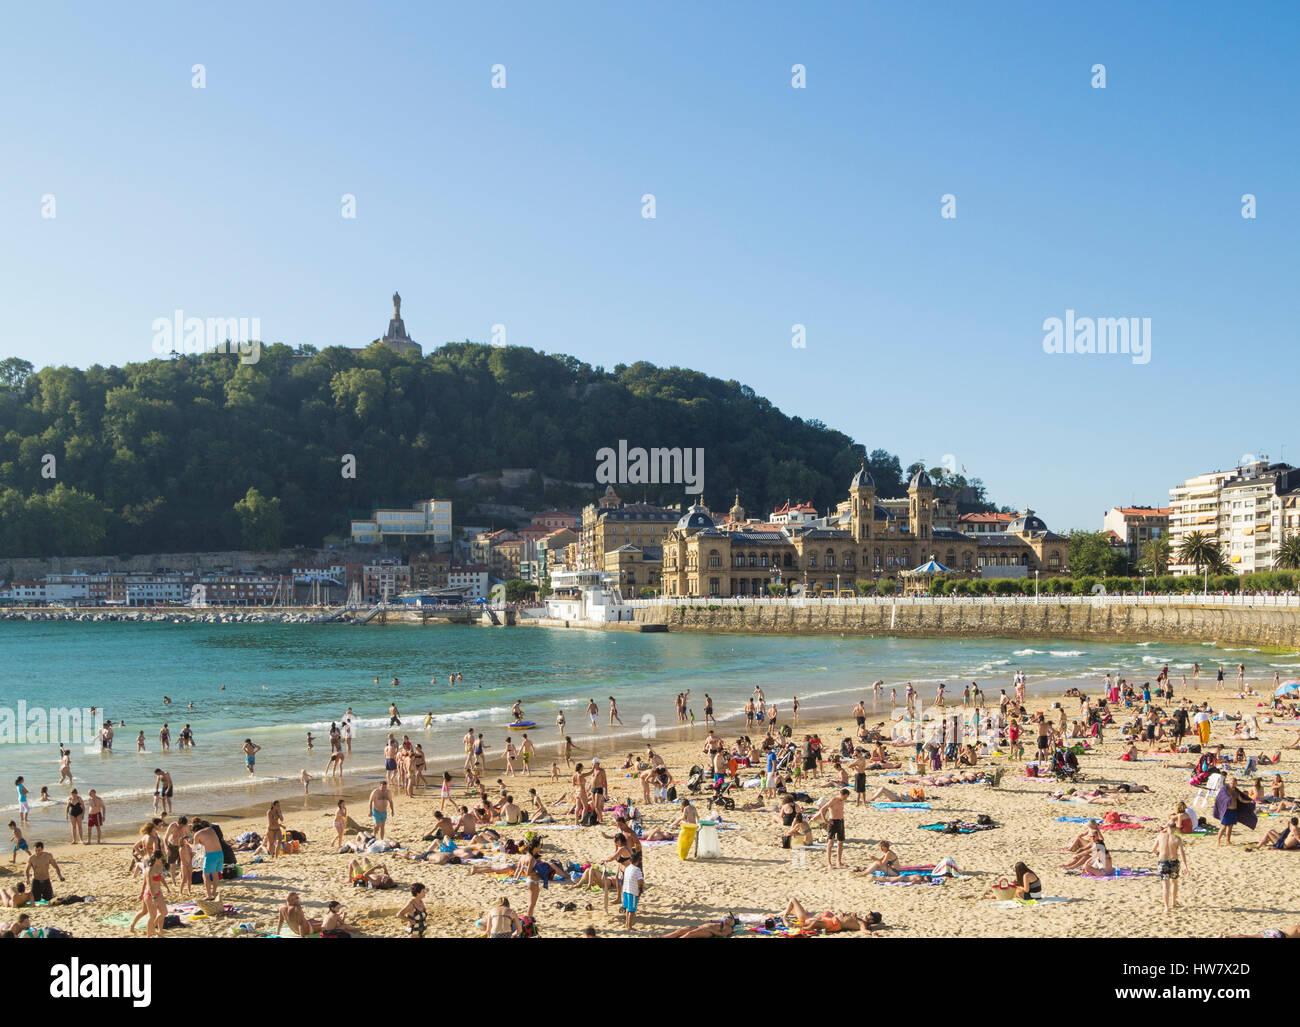 View over La Concha beach, Donostia, San Sebastian, Spain - Stock Image